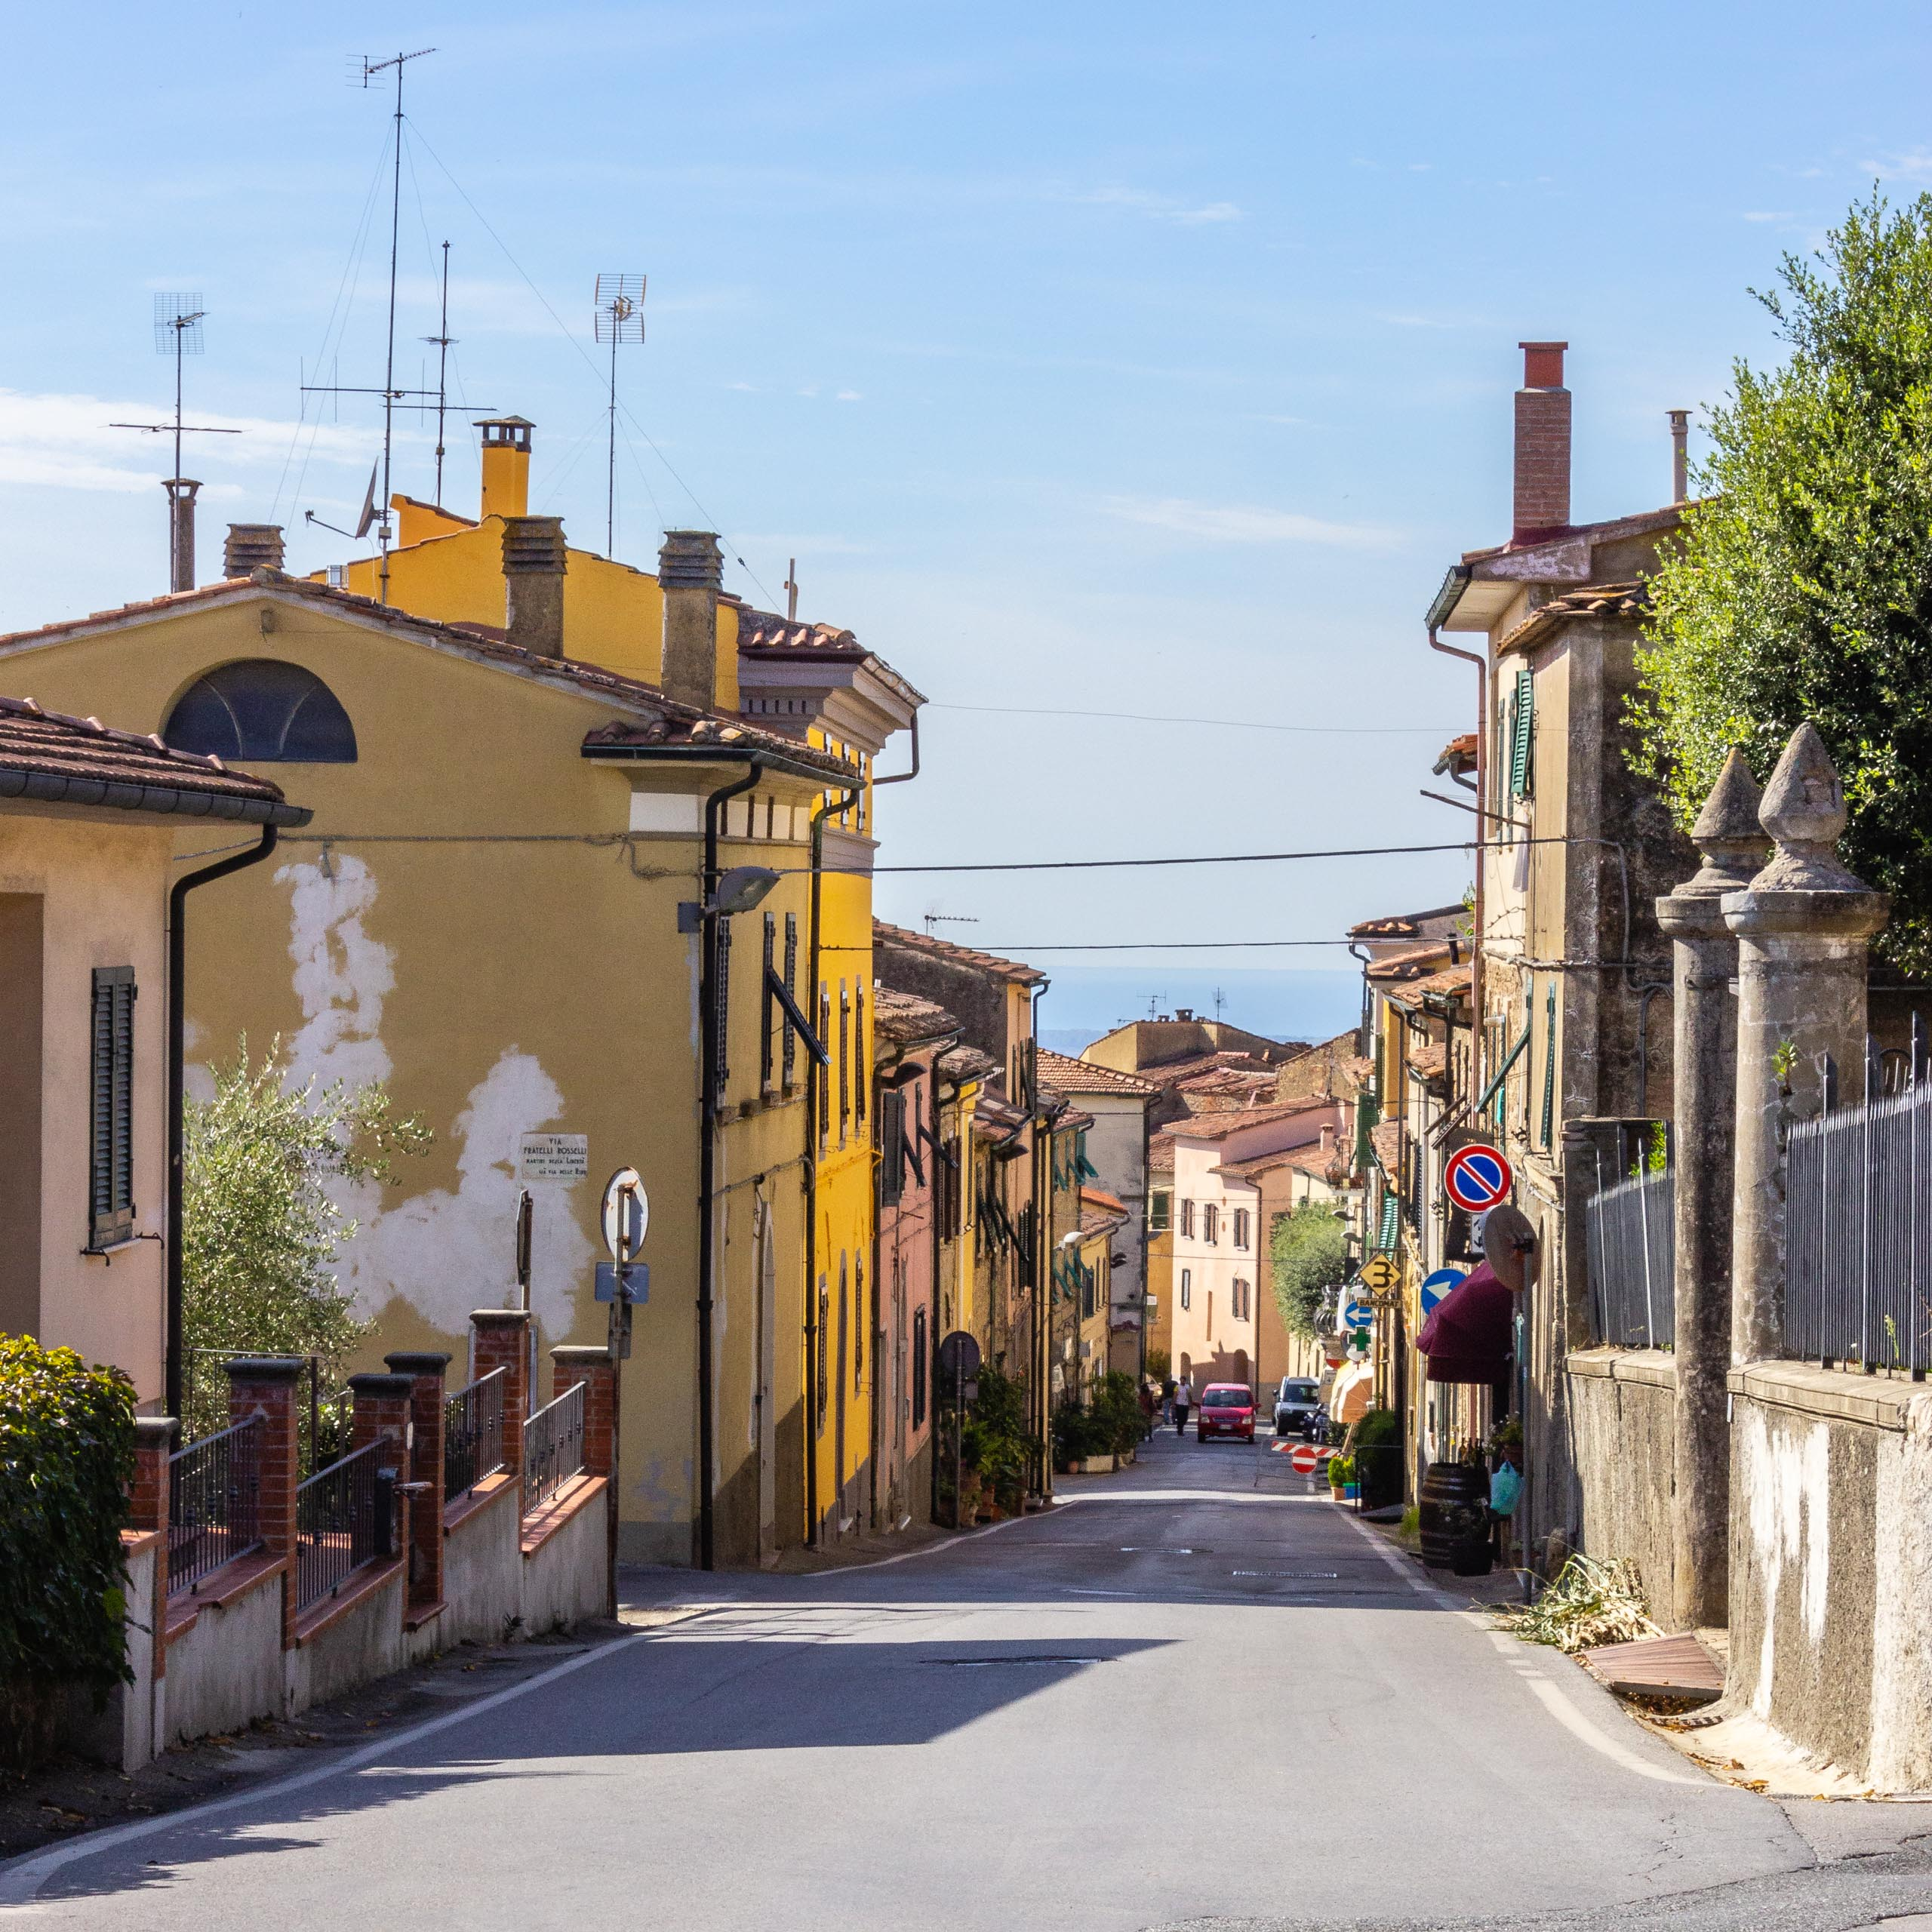 2013 10 Tuscany Montescudaio 001